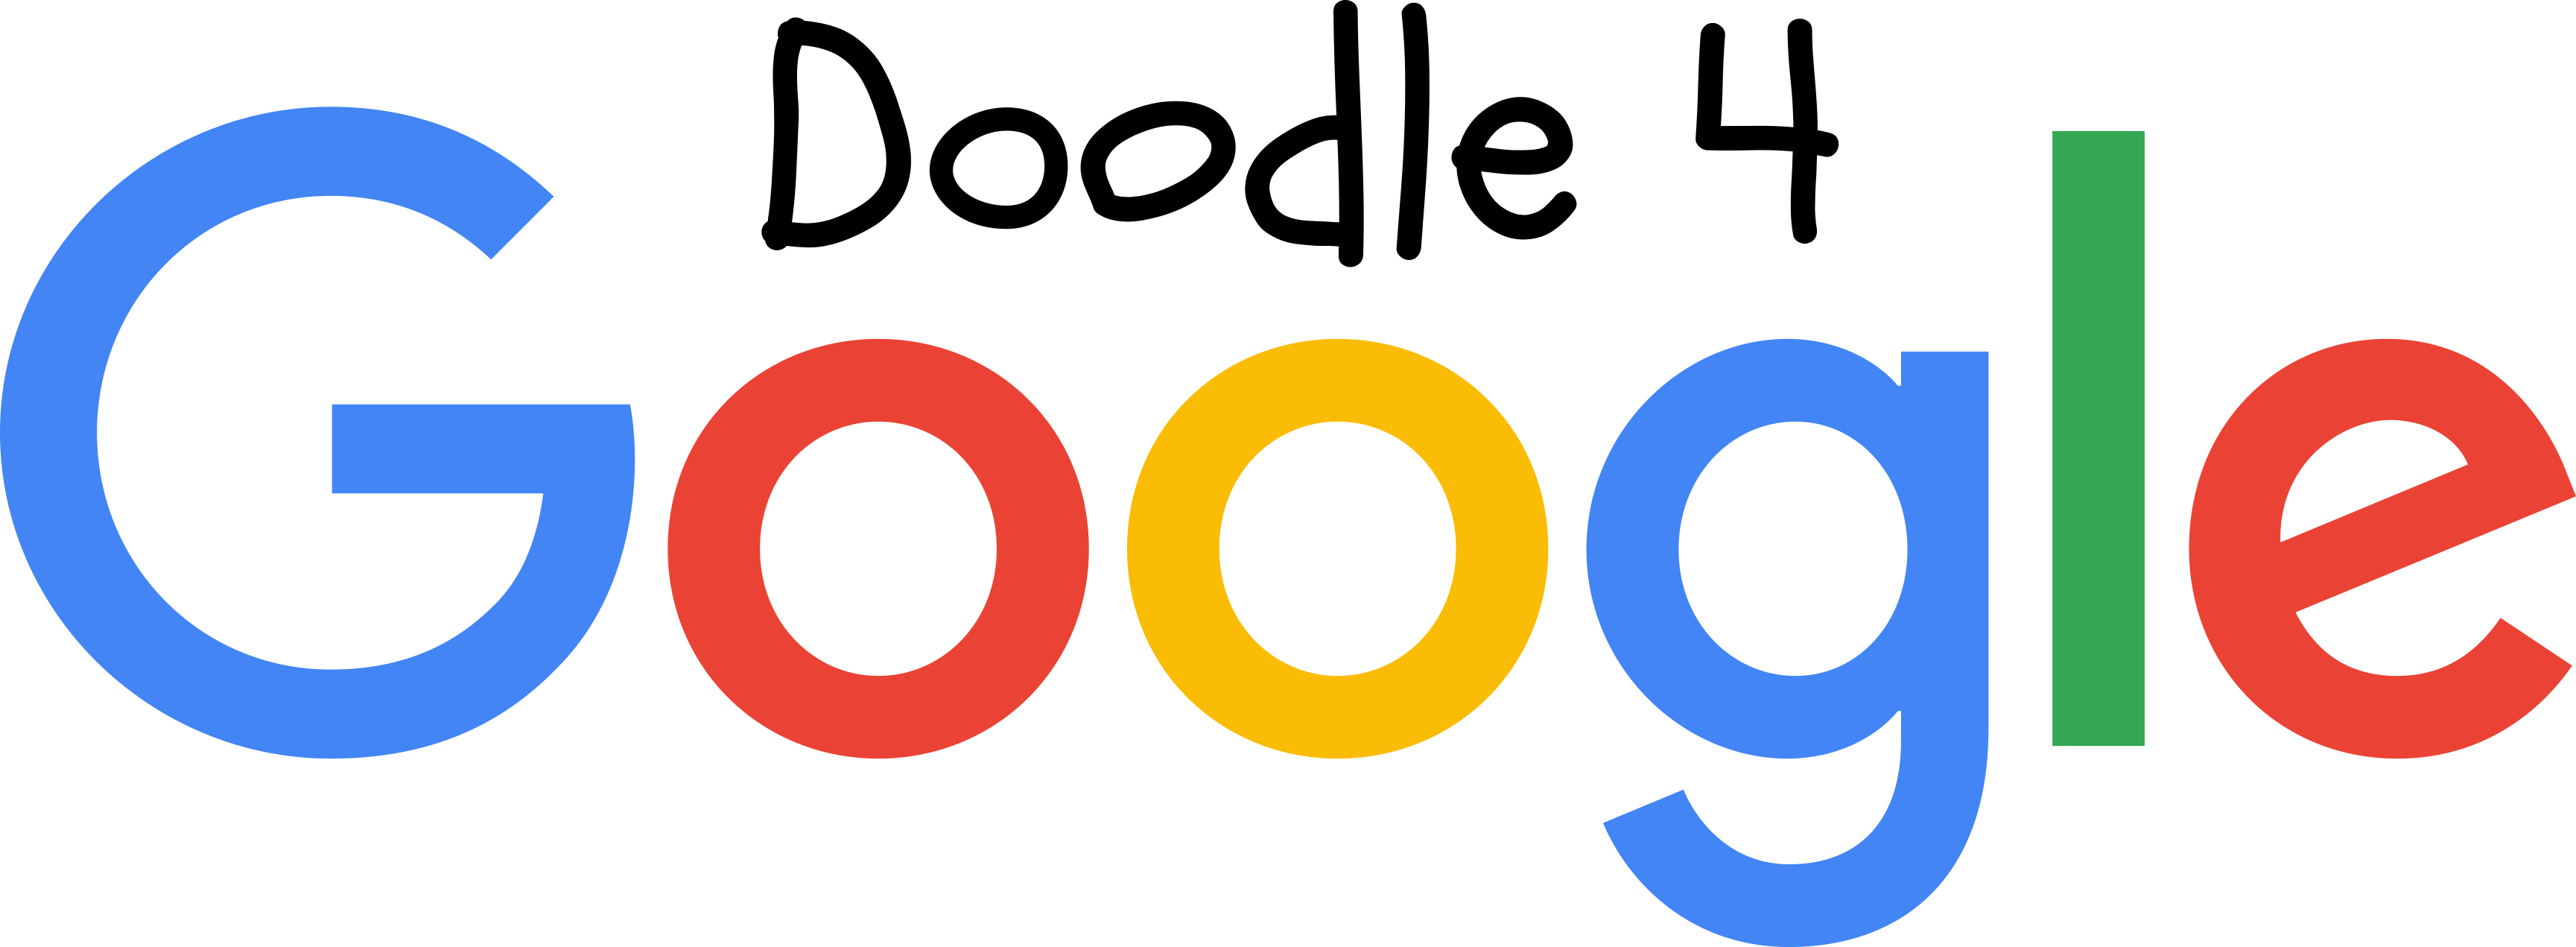 3458x1271 Google Clip Art Transparent Google Clip Art.png Images. Pluspng